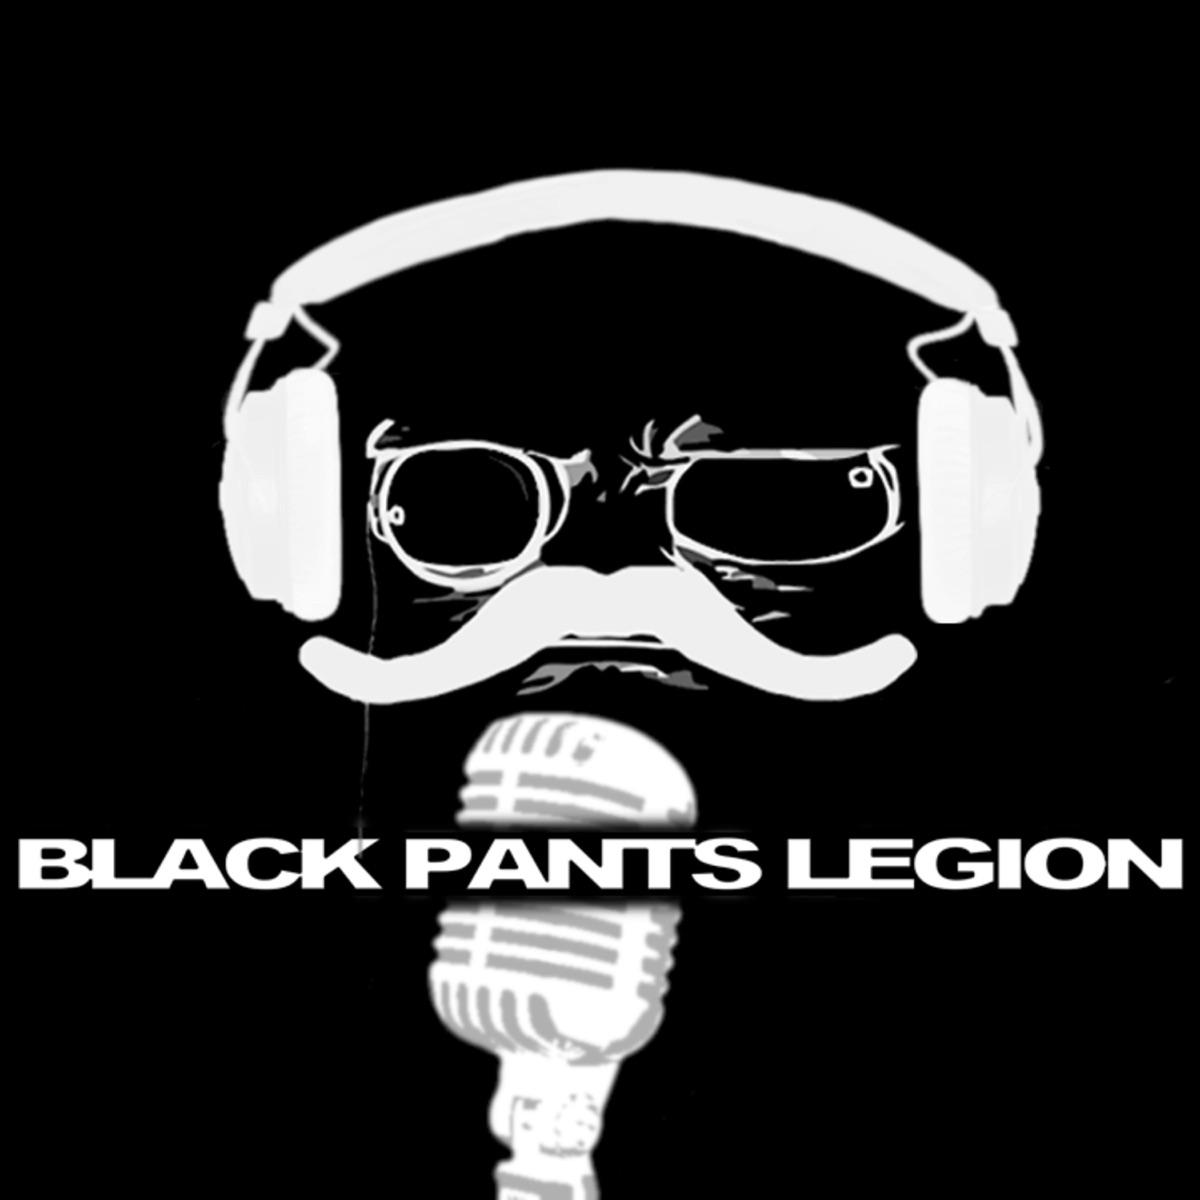 The Black Pants Legion Podcast